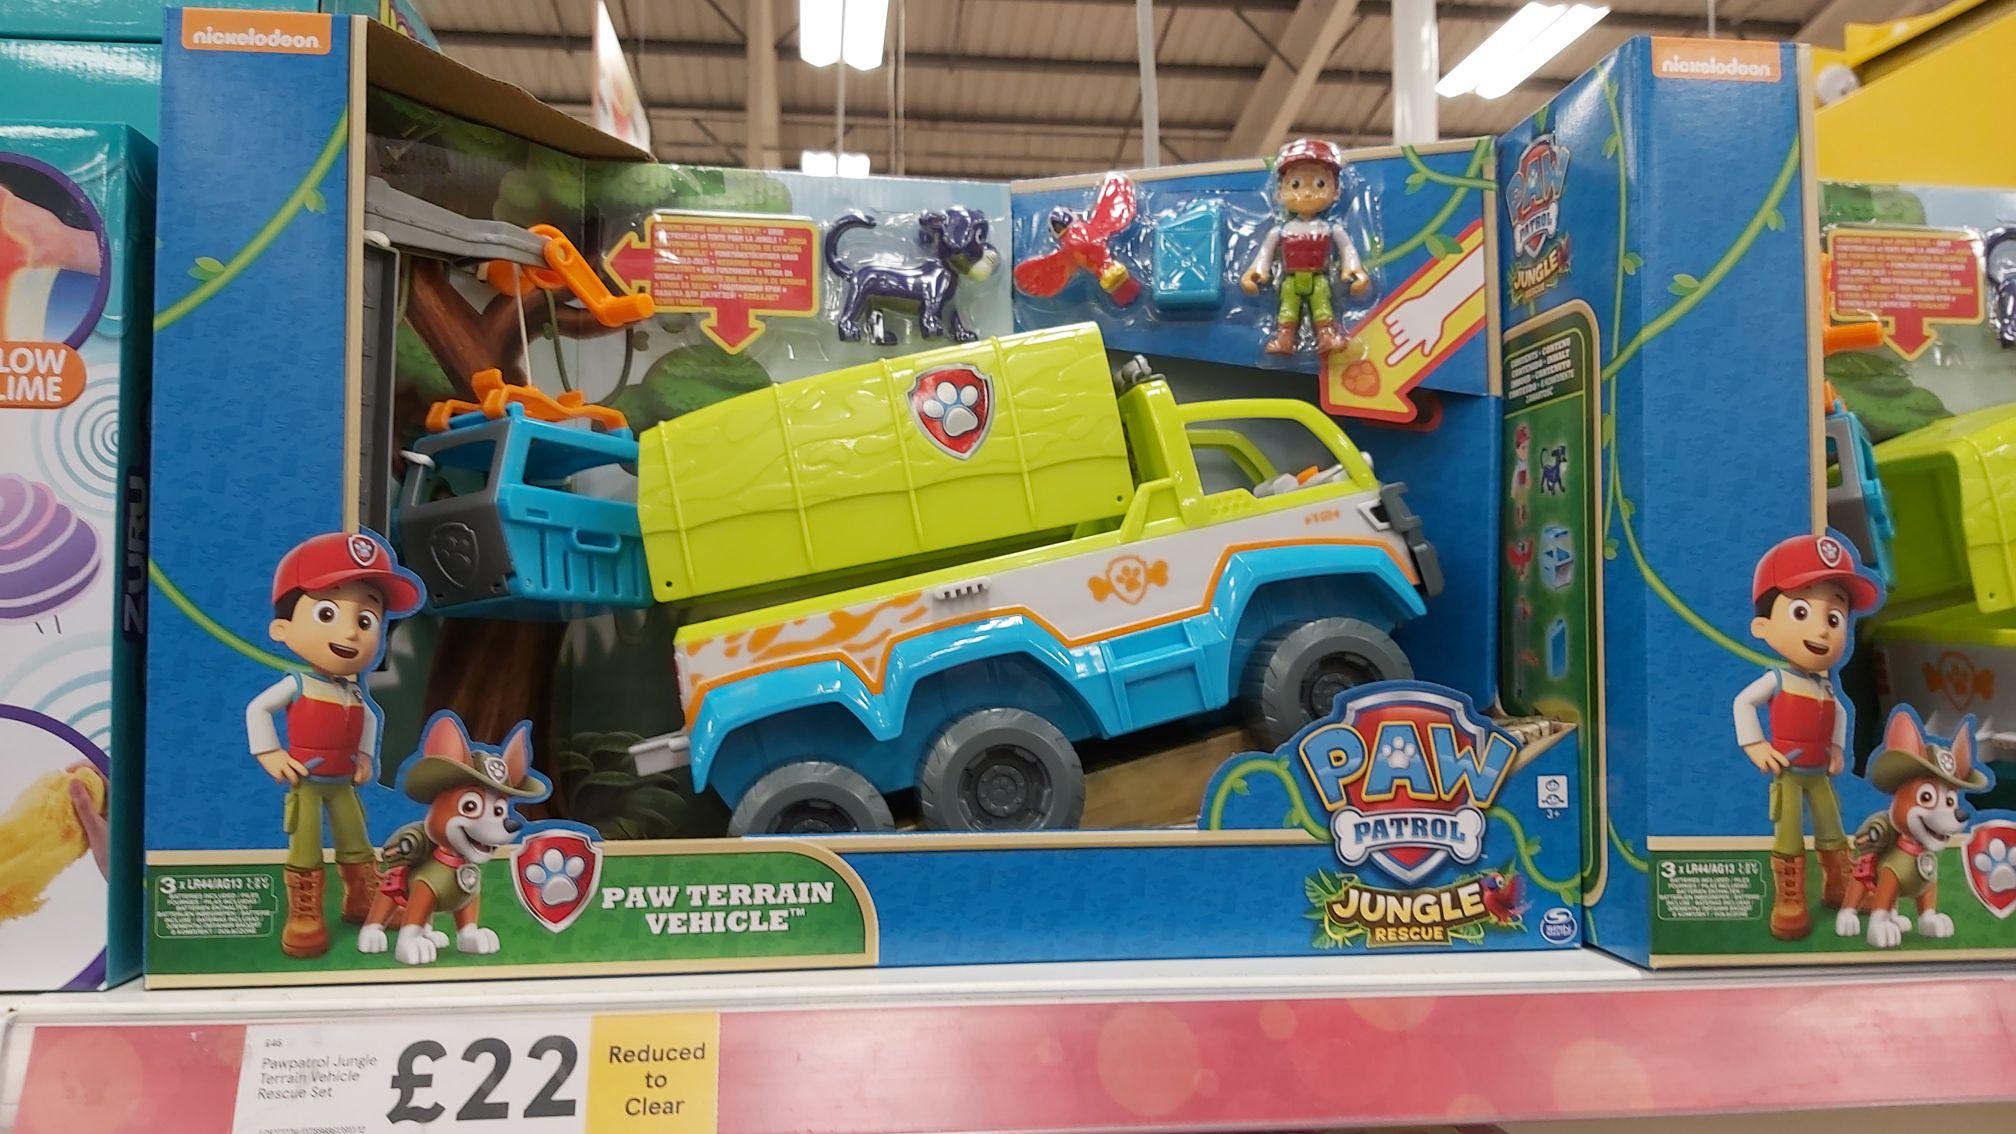 Paw Patrol Jungle Rescue Paw Terrain Truck £22 instore @ Tesco Forge Retail Park, Glasgow